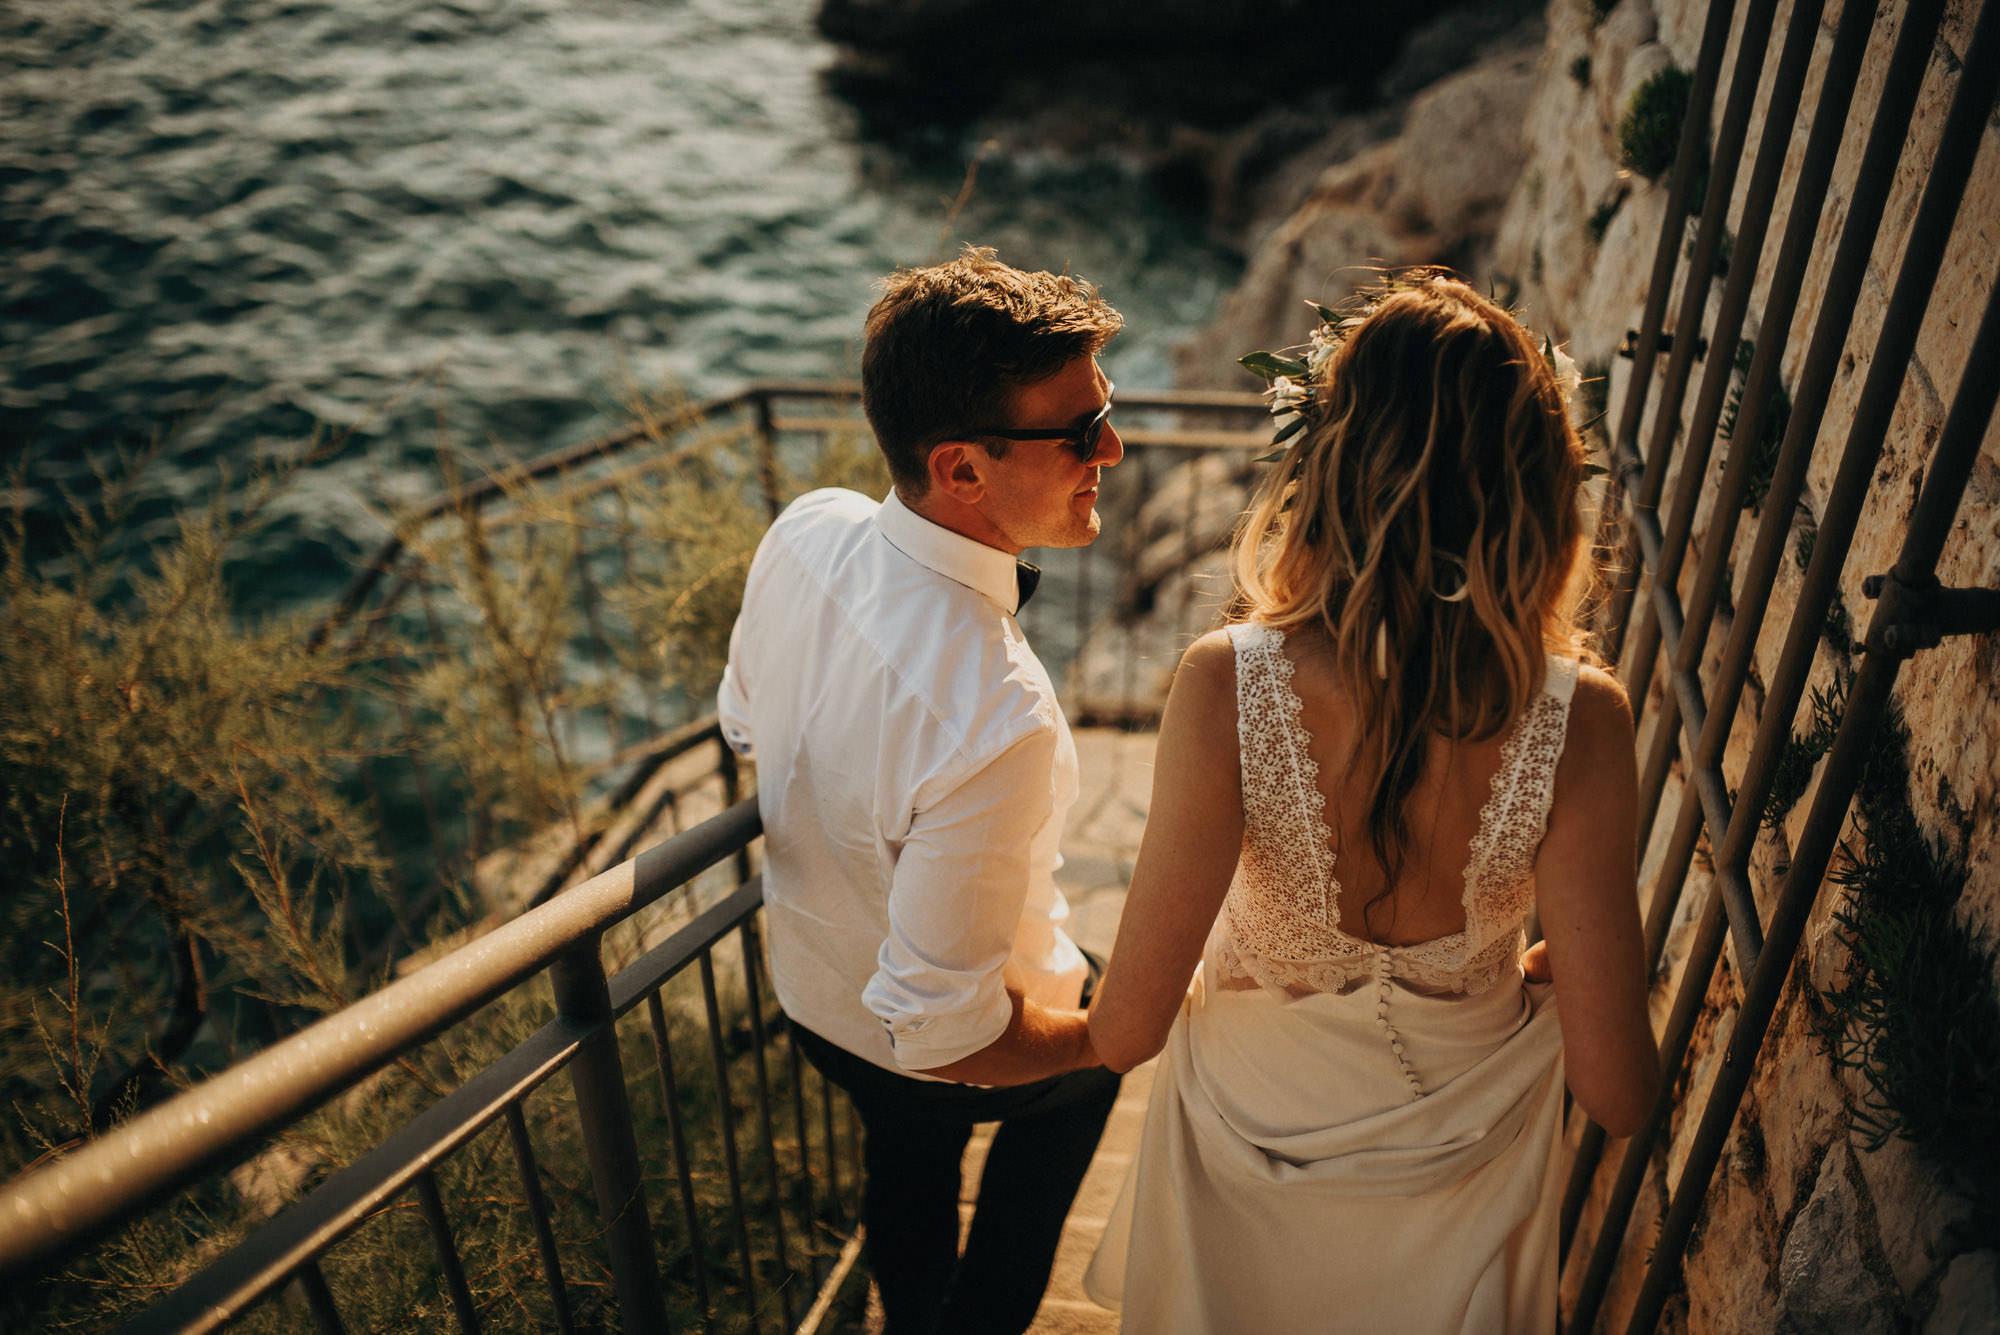 dubrovnik_croatia_wedding_photographer-jere_satamo-destination_weddings-079-web.jpg